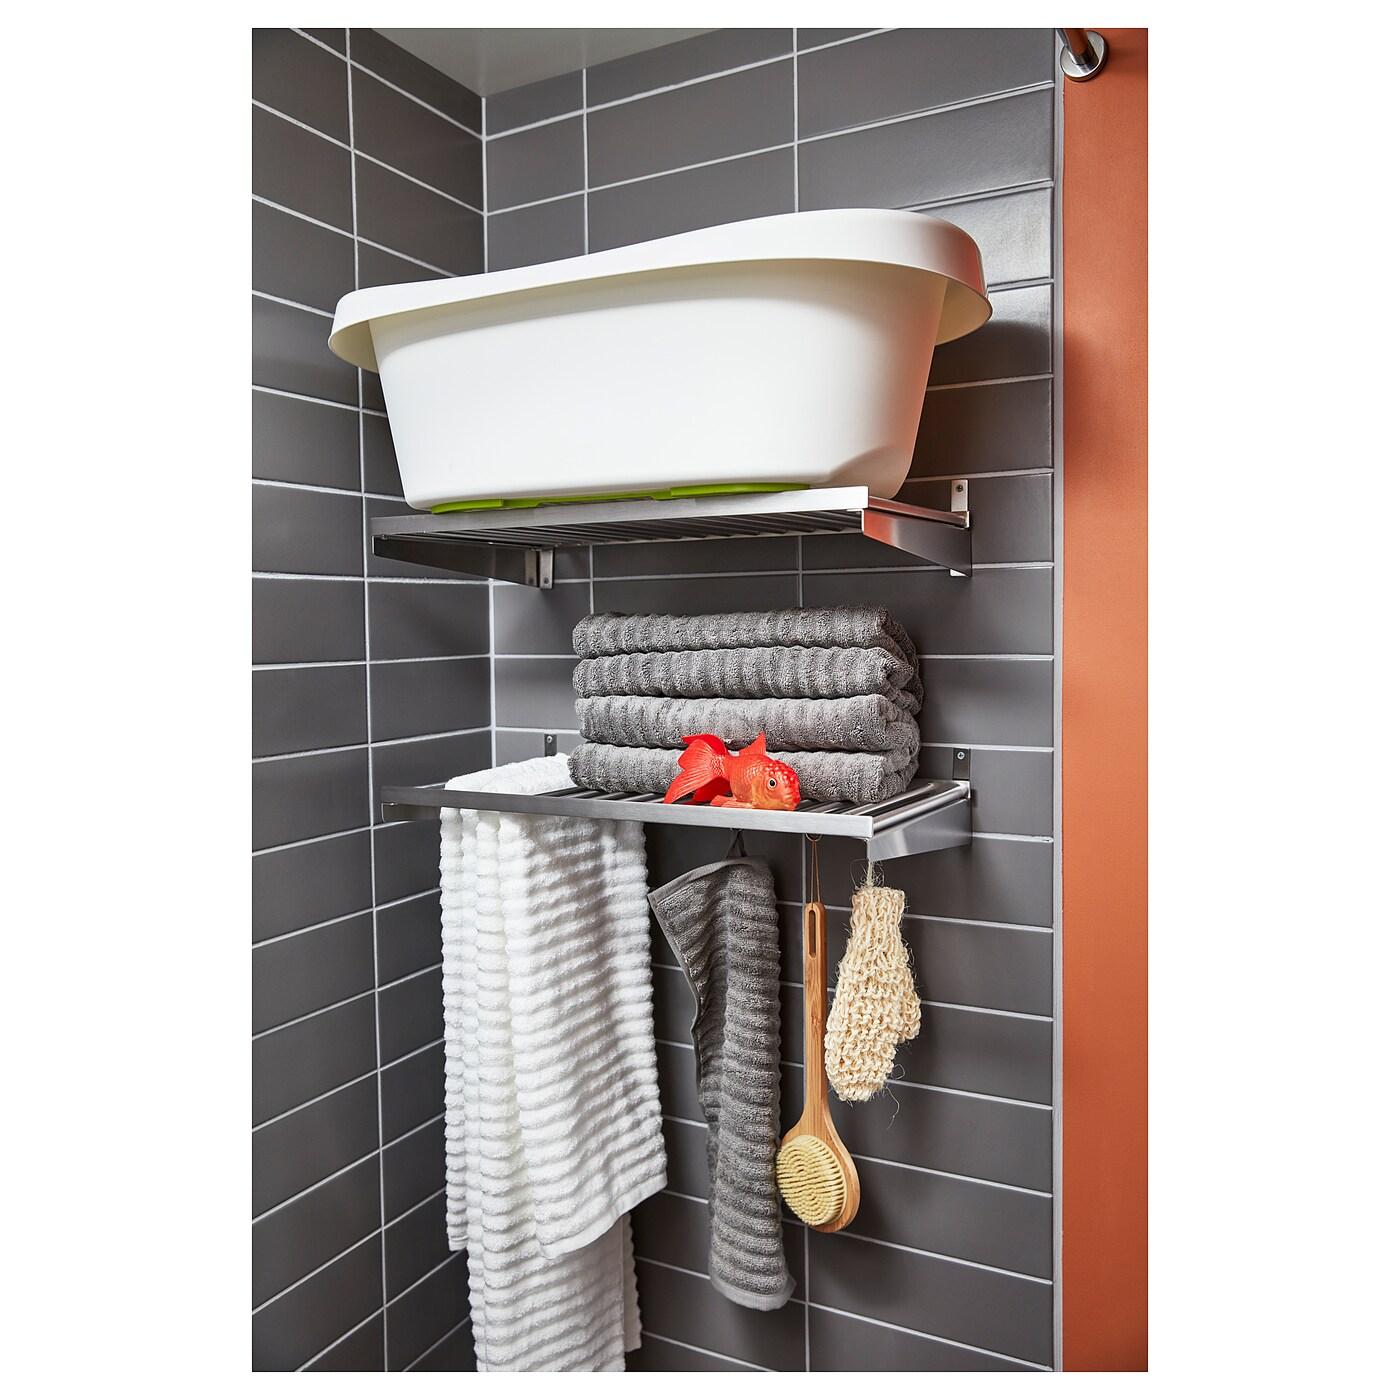 KUNGSFORS Shelf, stainless steel, 60 cm